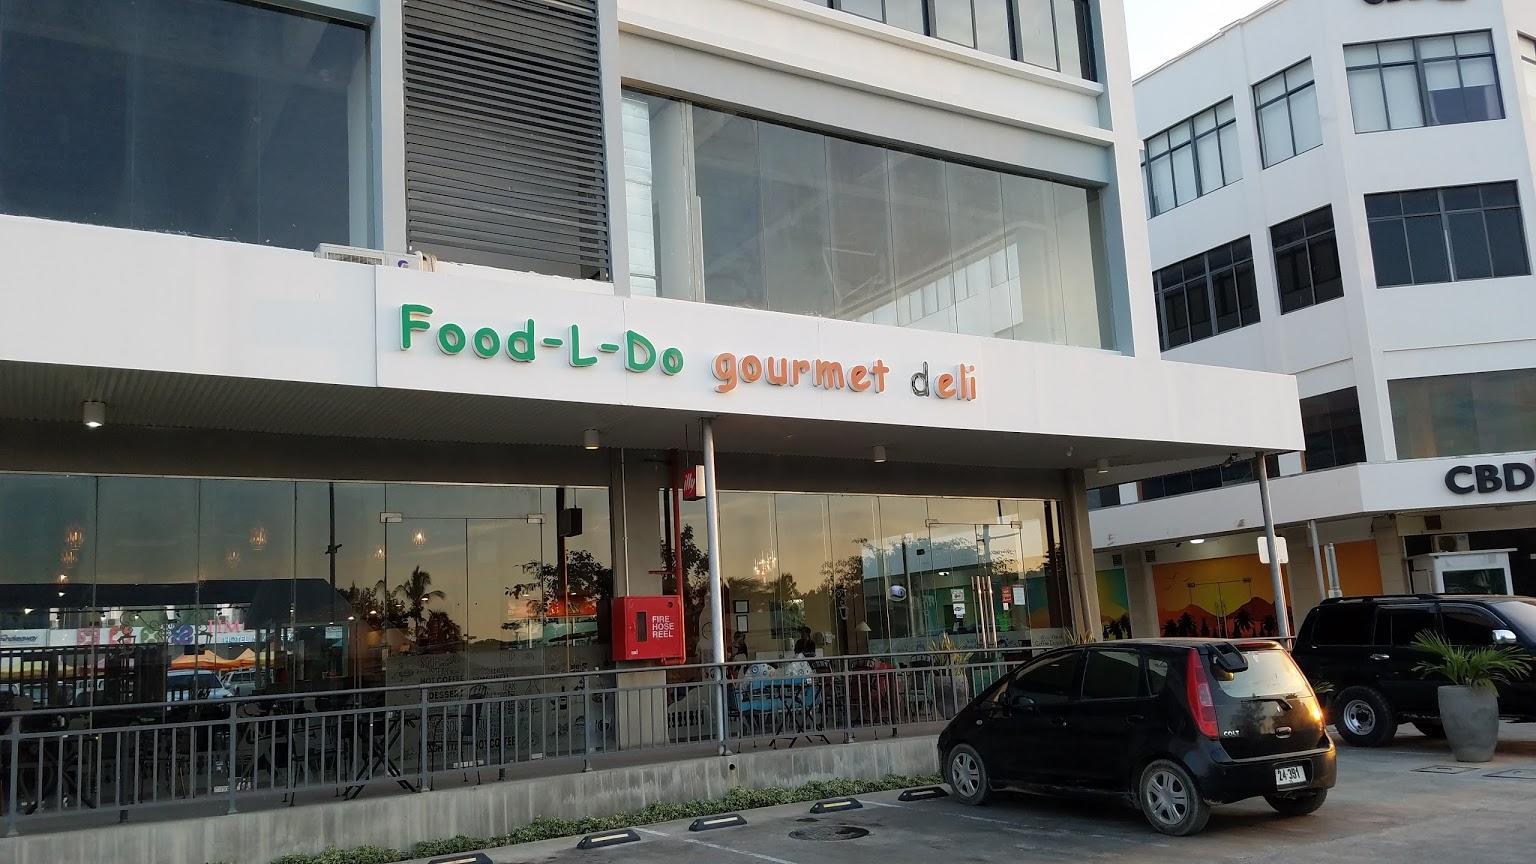 Food-L-Do